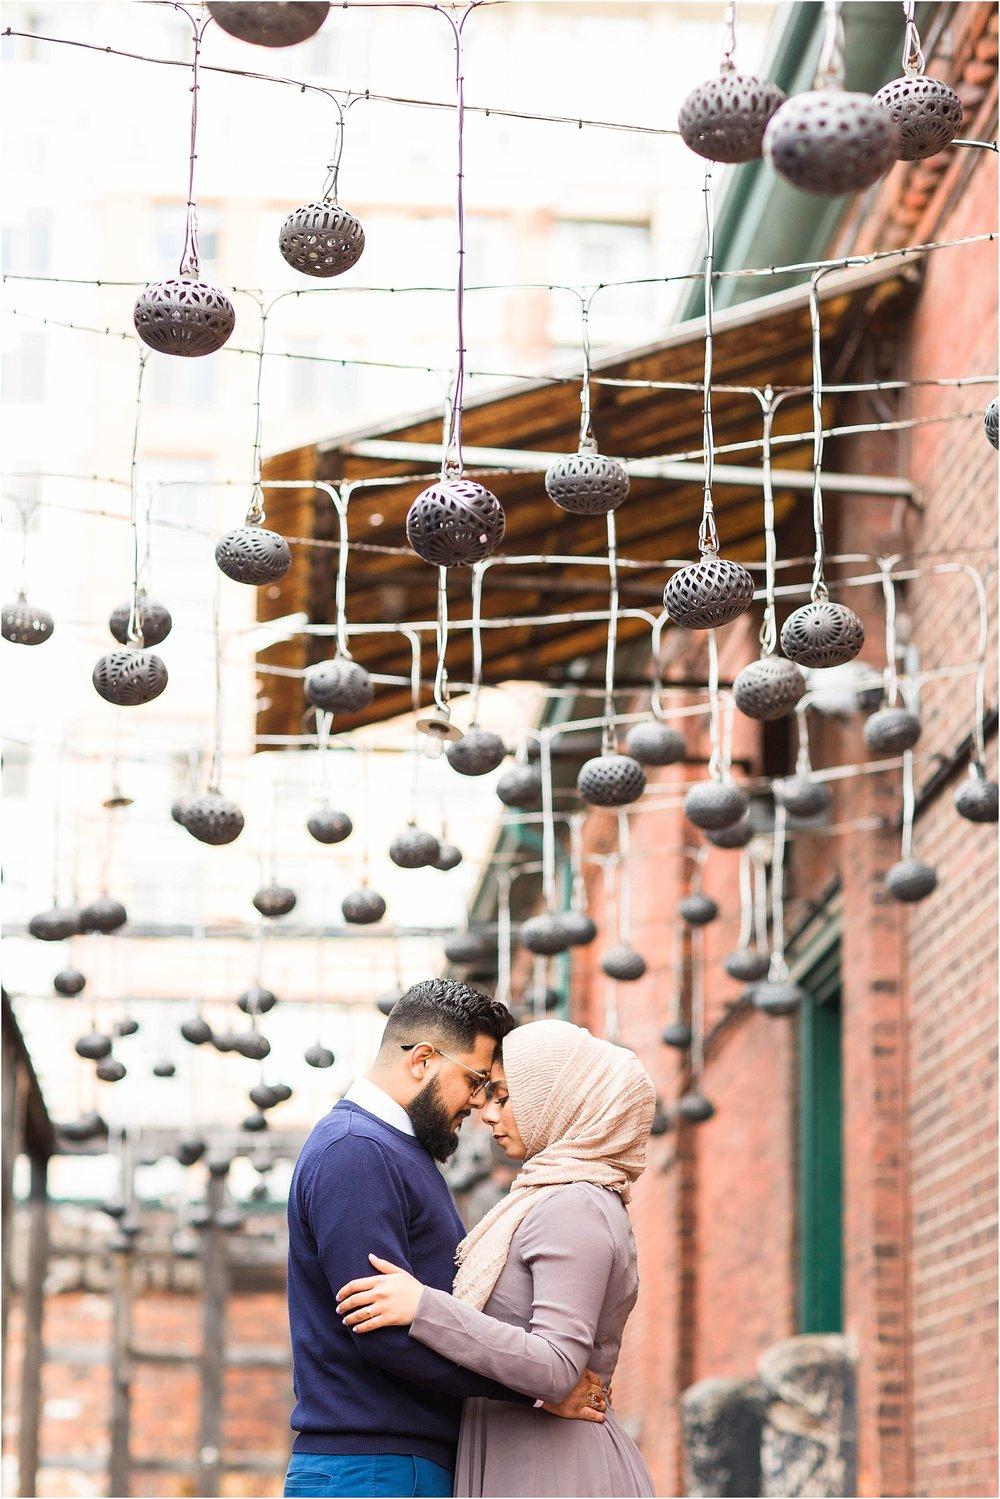 Polson-Pier-Distillery-District-Engagement-Session-Toronto-Mississauga-Brampton-Scarborough-GTA-Pakistani-Indian-Wedding-Engagement-Photographer-Photography_0050.jpg